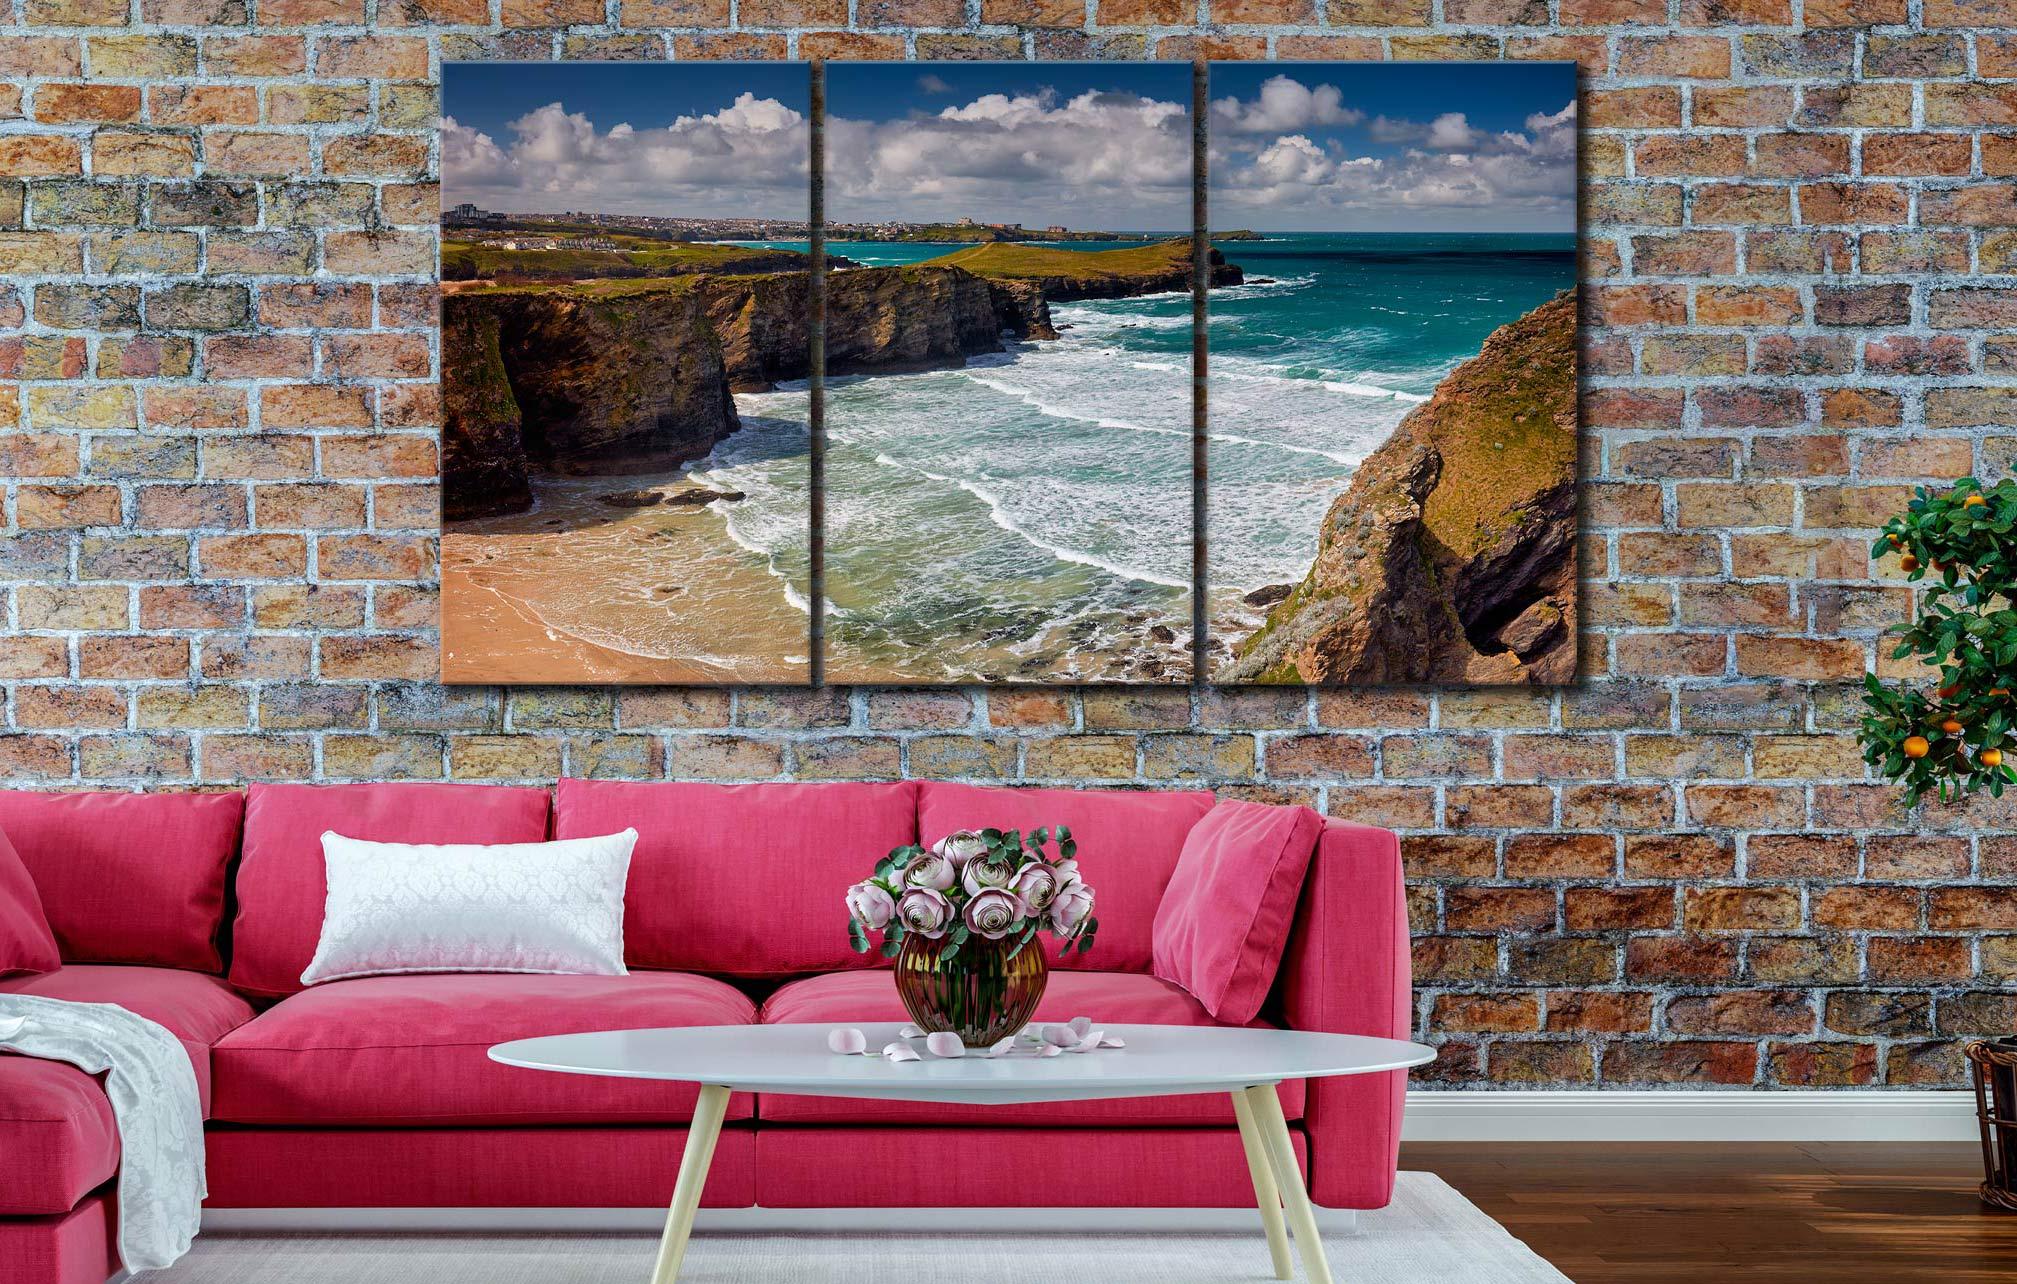 Porth Island - 3 Panel Canvas on Wall